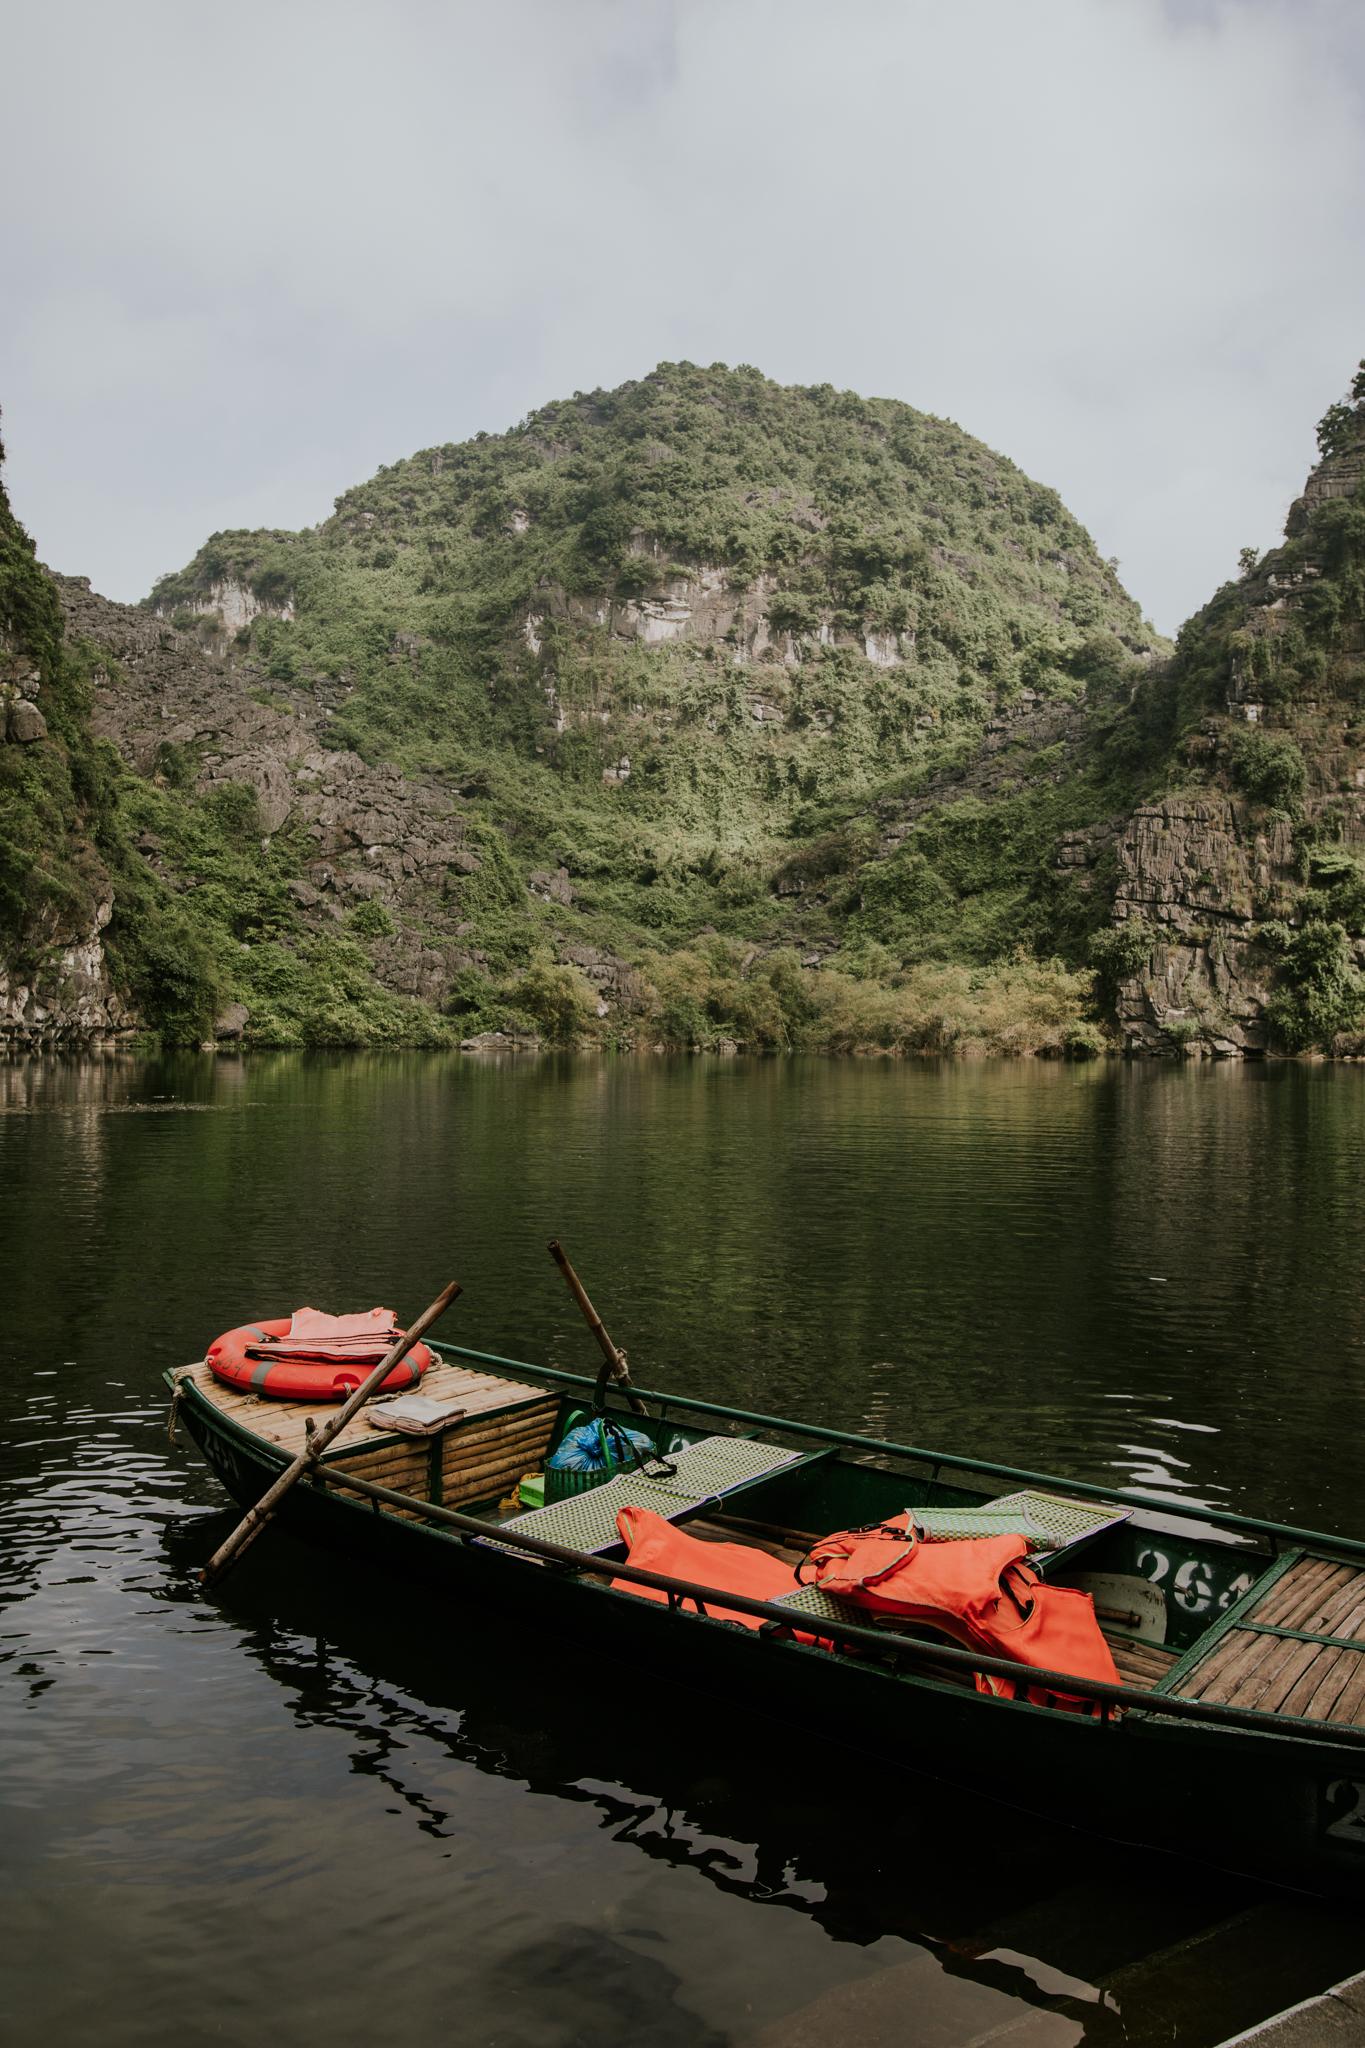 Trang An Grottoes Boat Ride - Ninh Binh Vietnam   Destination Elopement Photographer   Vow of the Wild